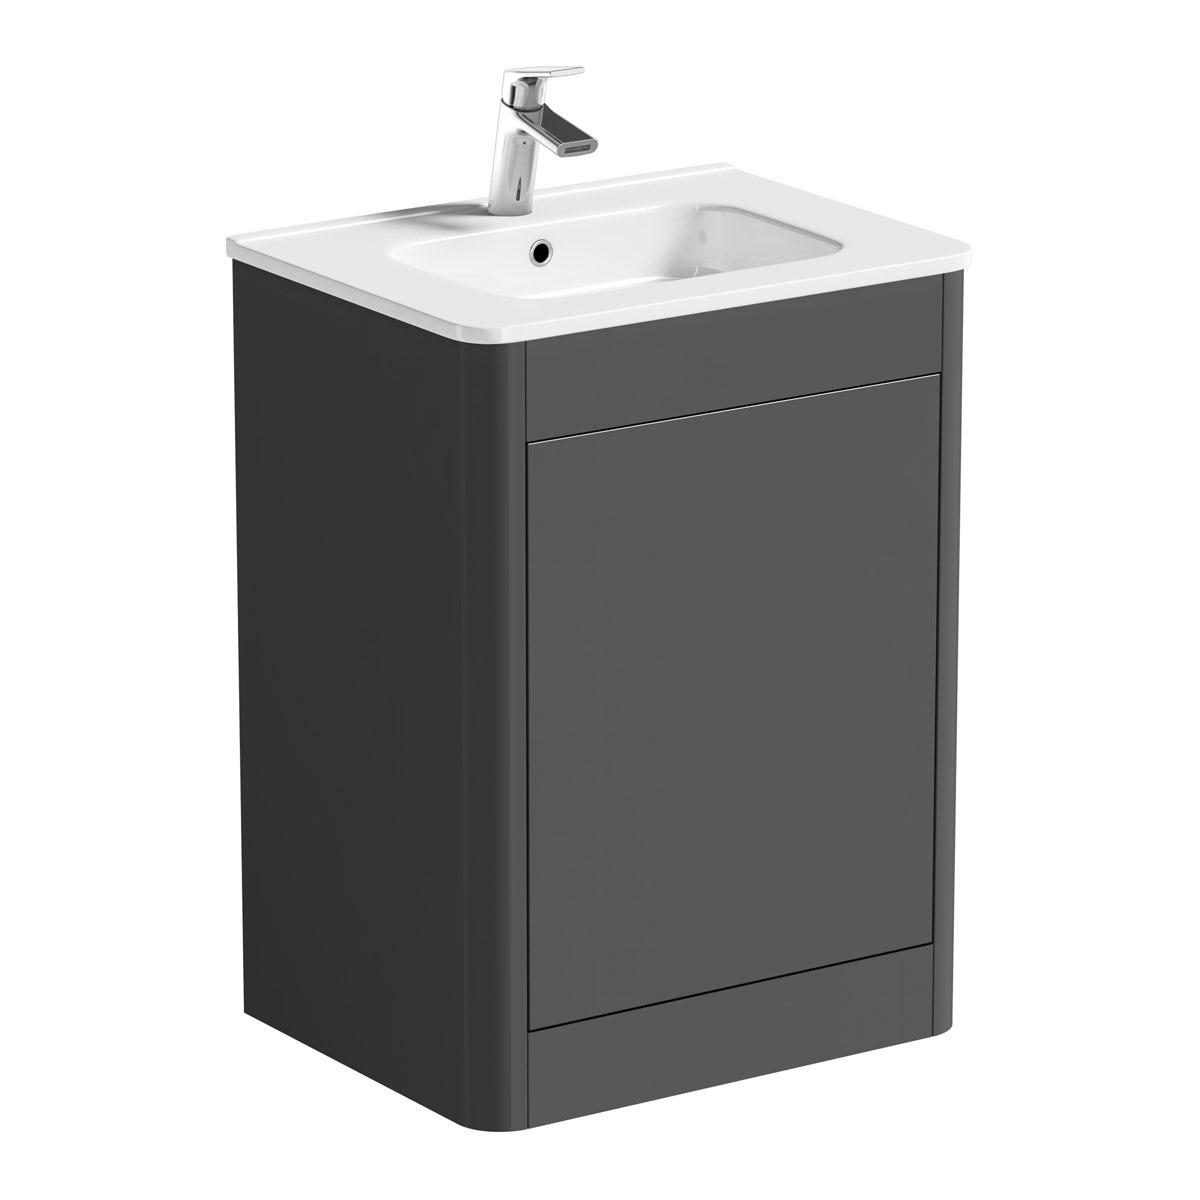 Mode Carter slate grey vanity unit and ceramic basin 600mm